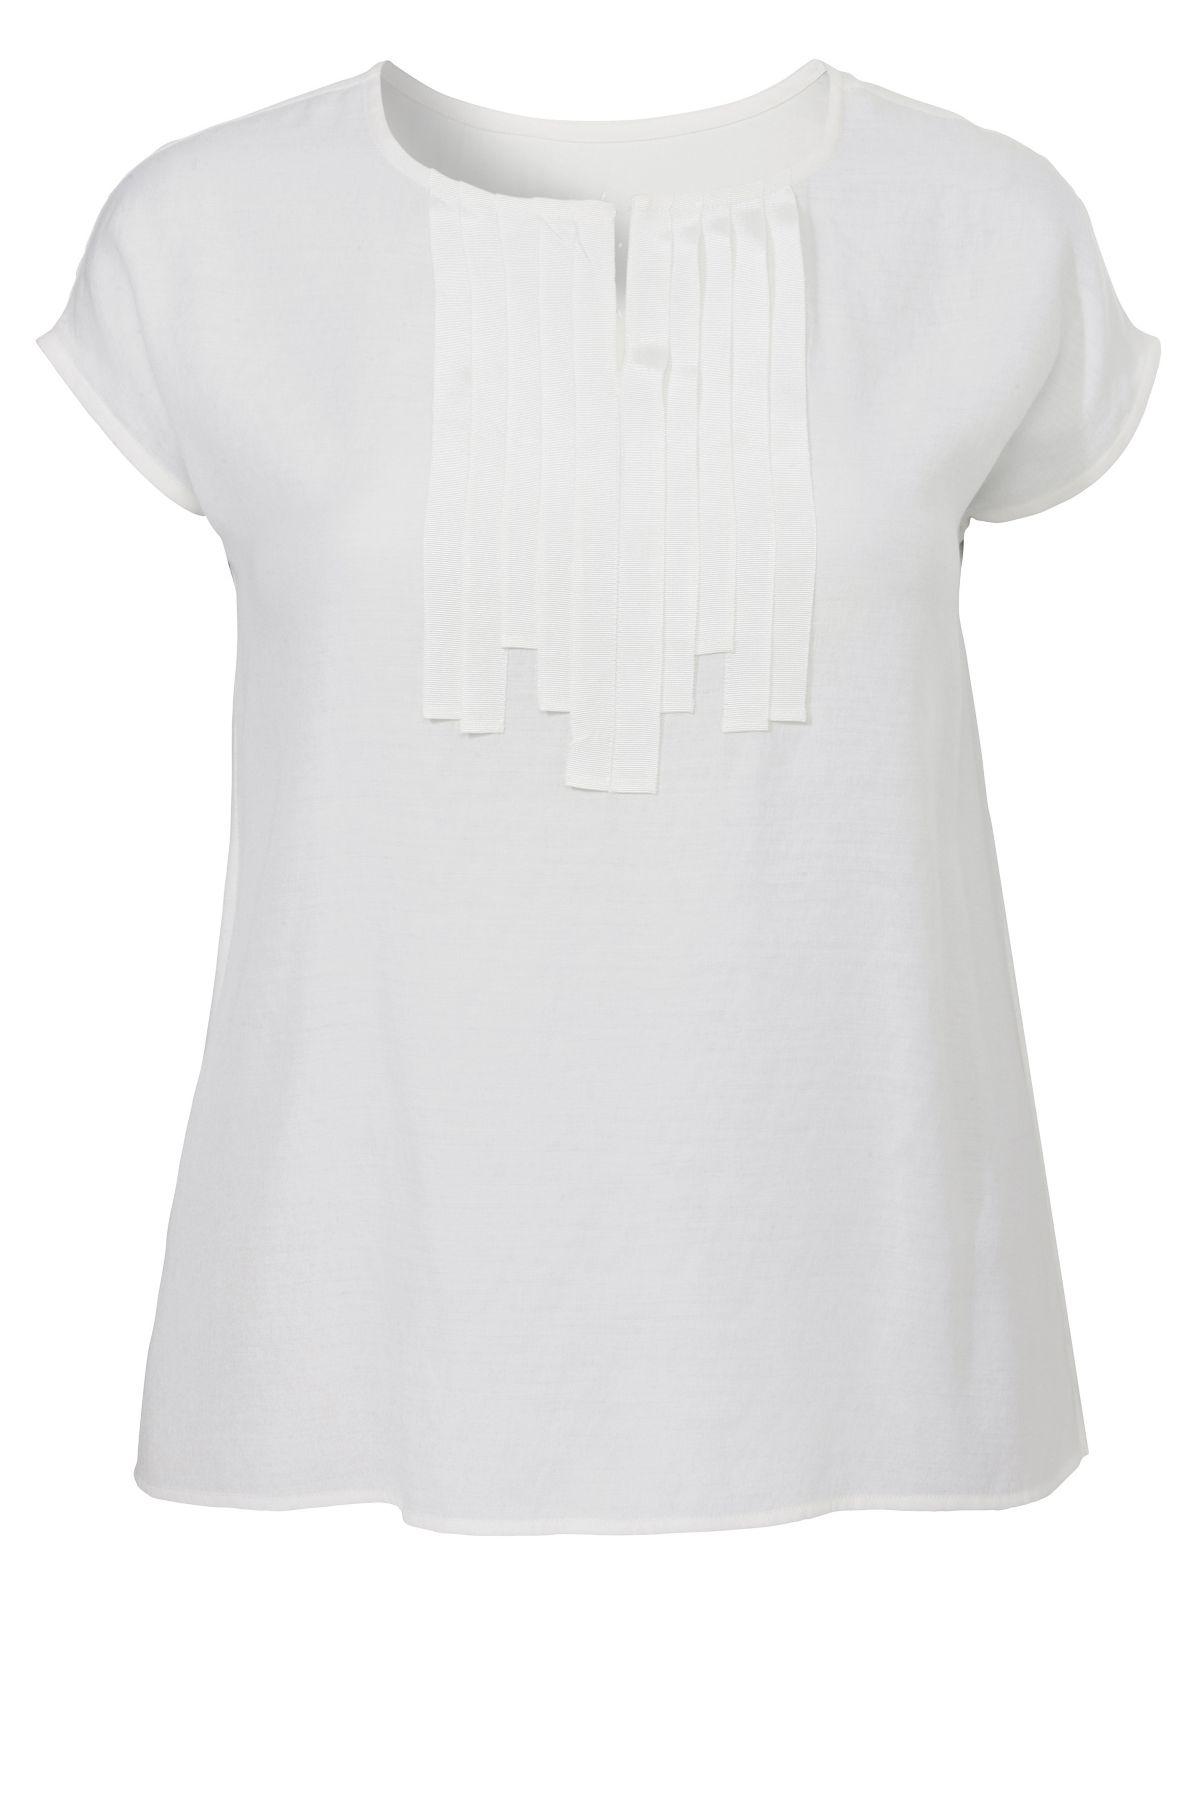 VIA APPIA DUE Monochromes Kombi-Shirt mit dekor...